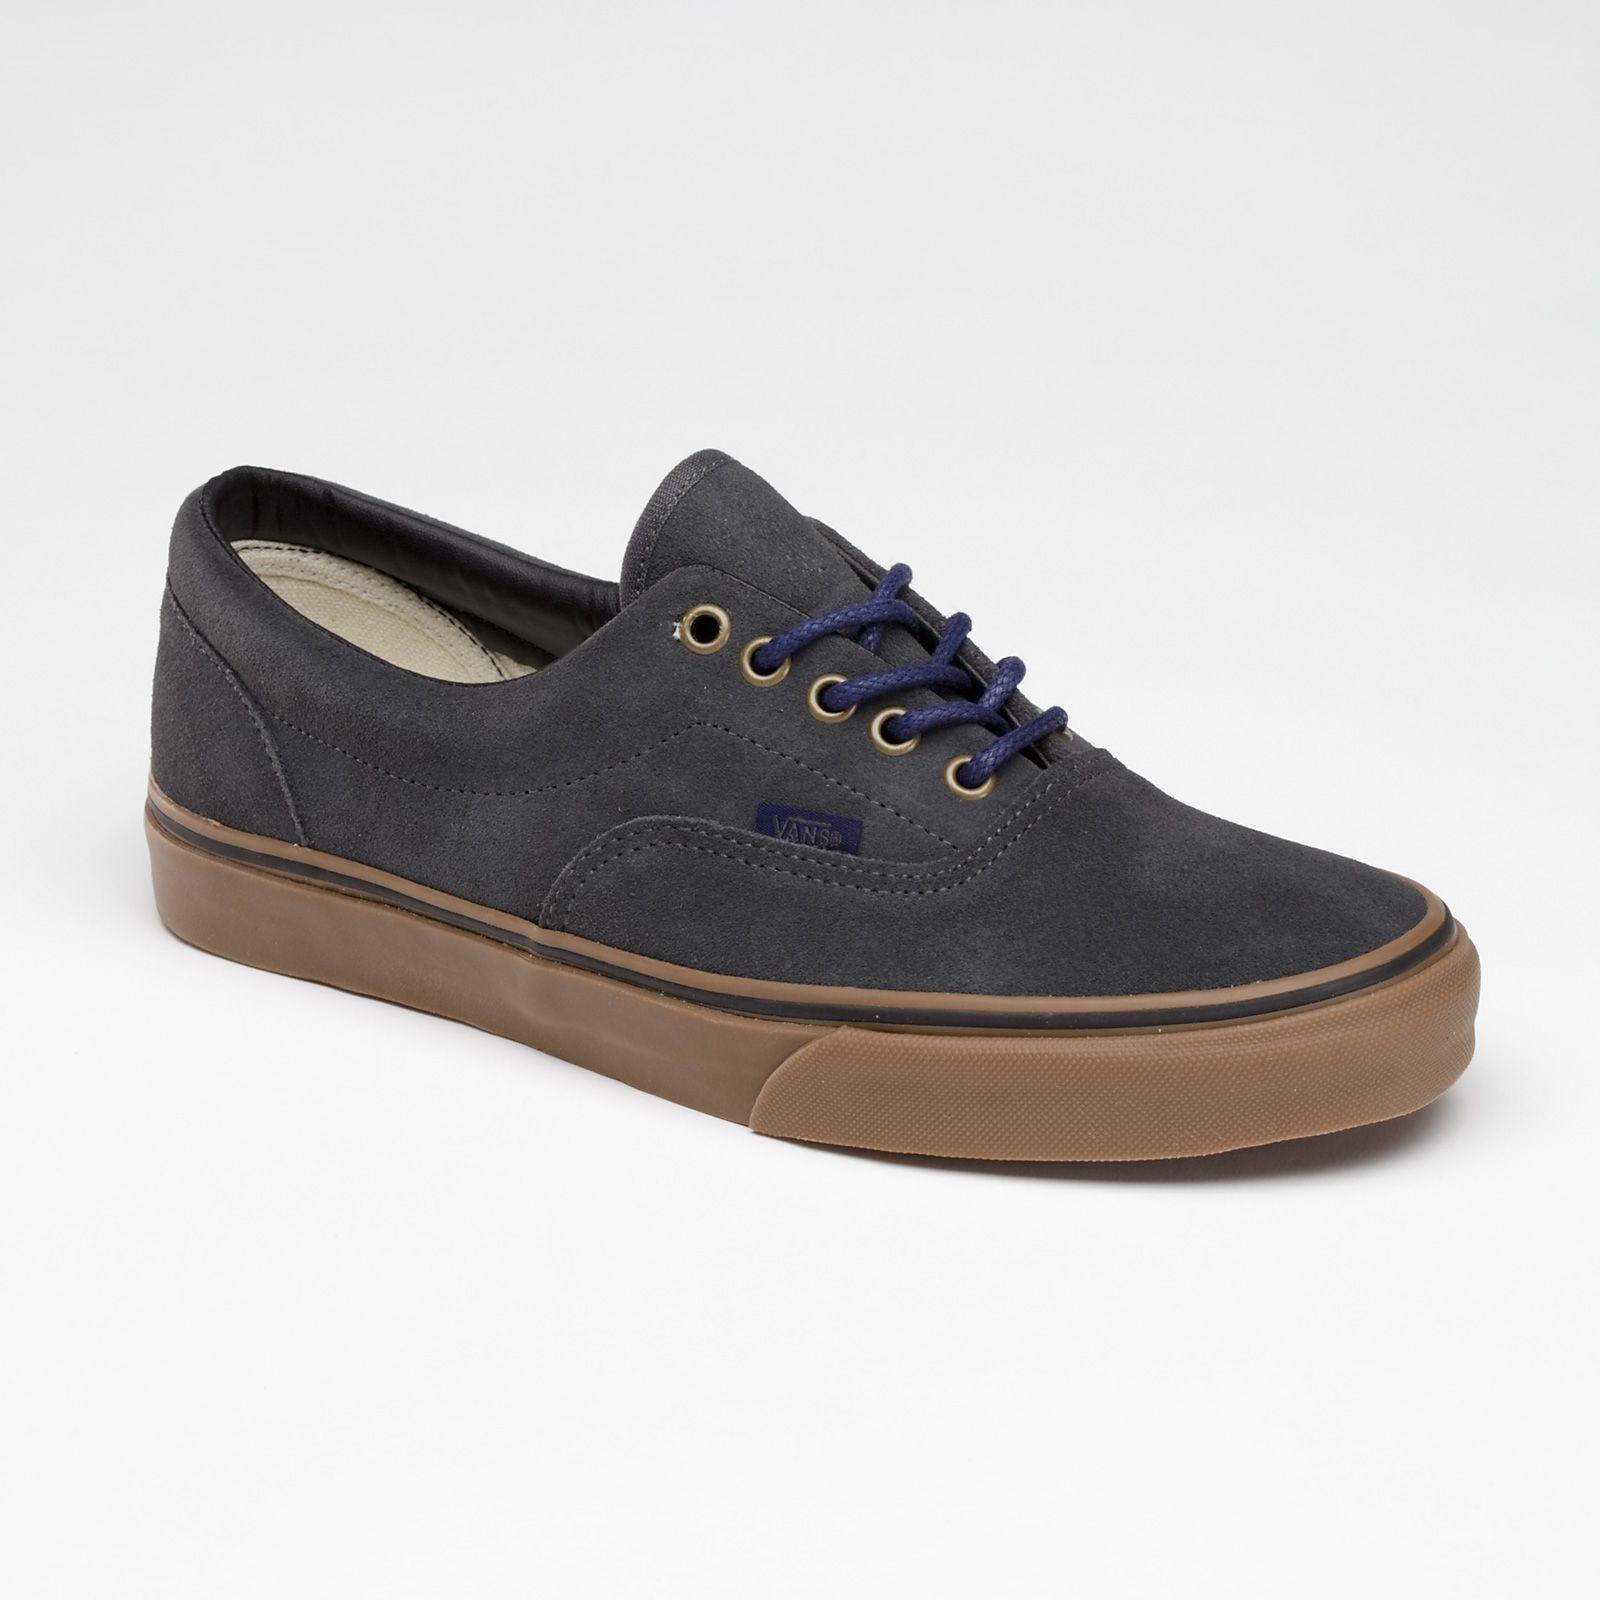 vans chaussures official website